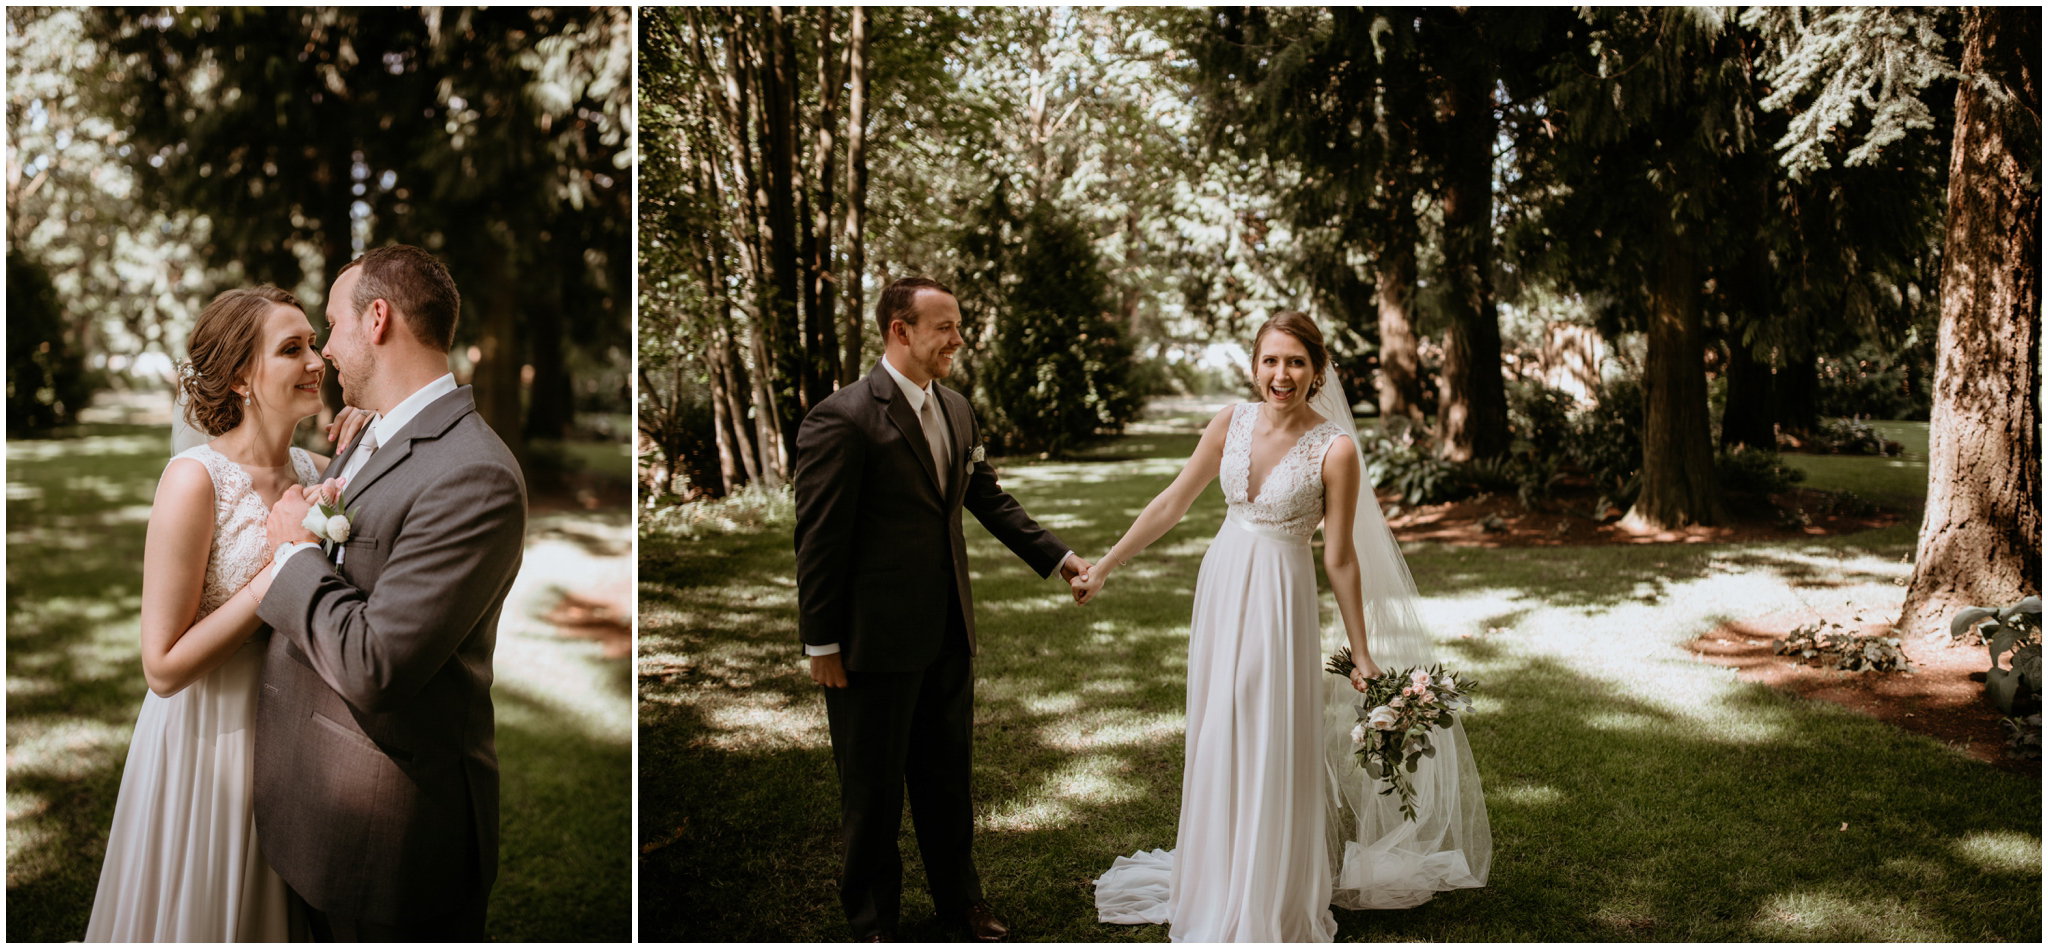 erin-and-tyler-evergreen-gardens-bellingham-wedding-photographer-072.jpg